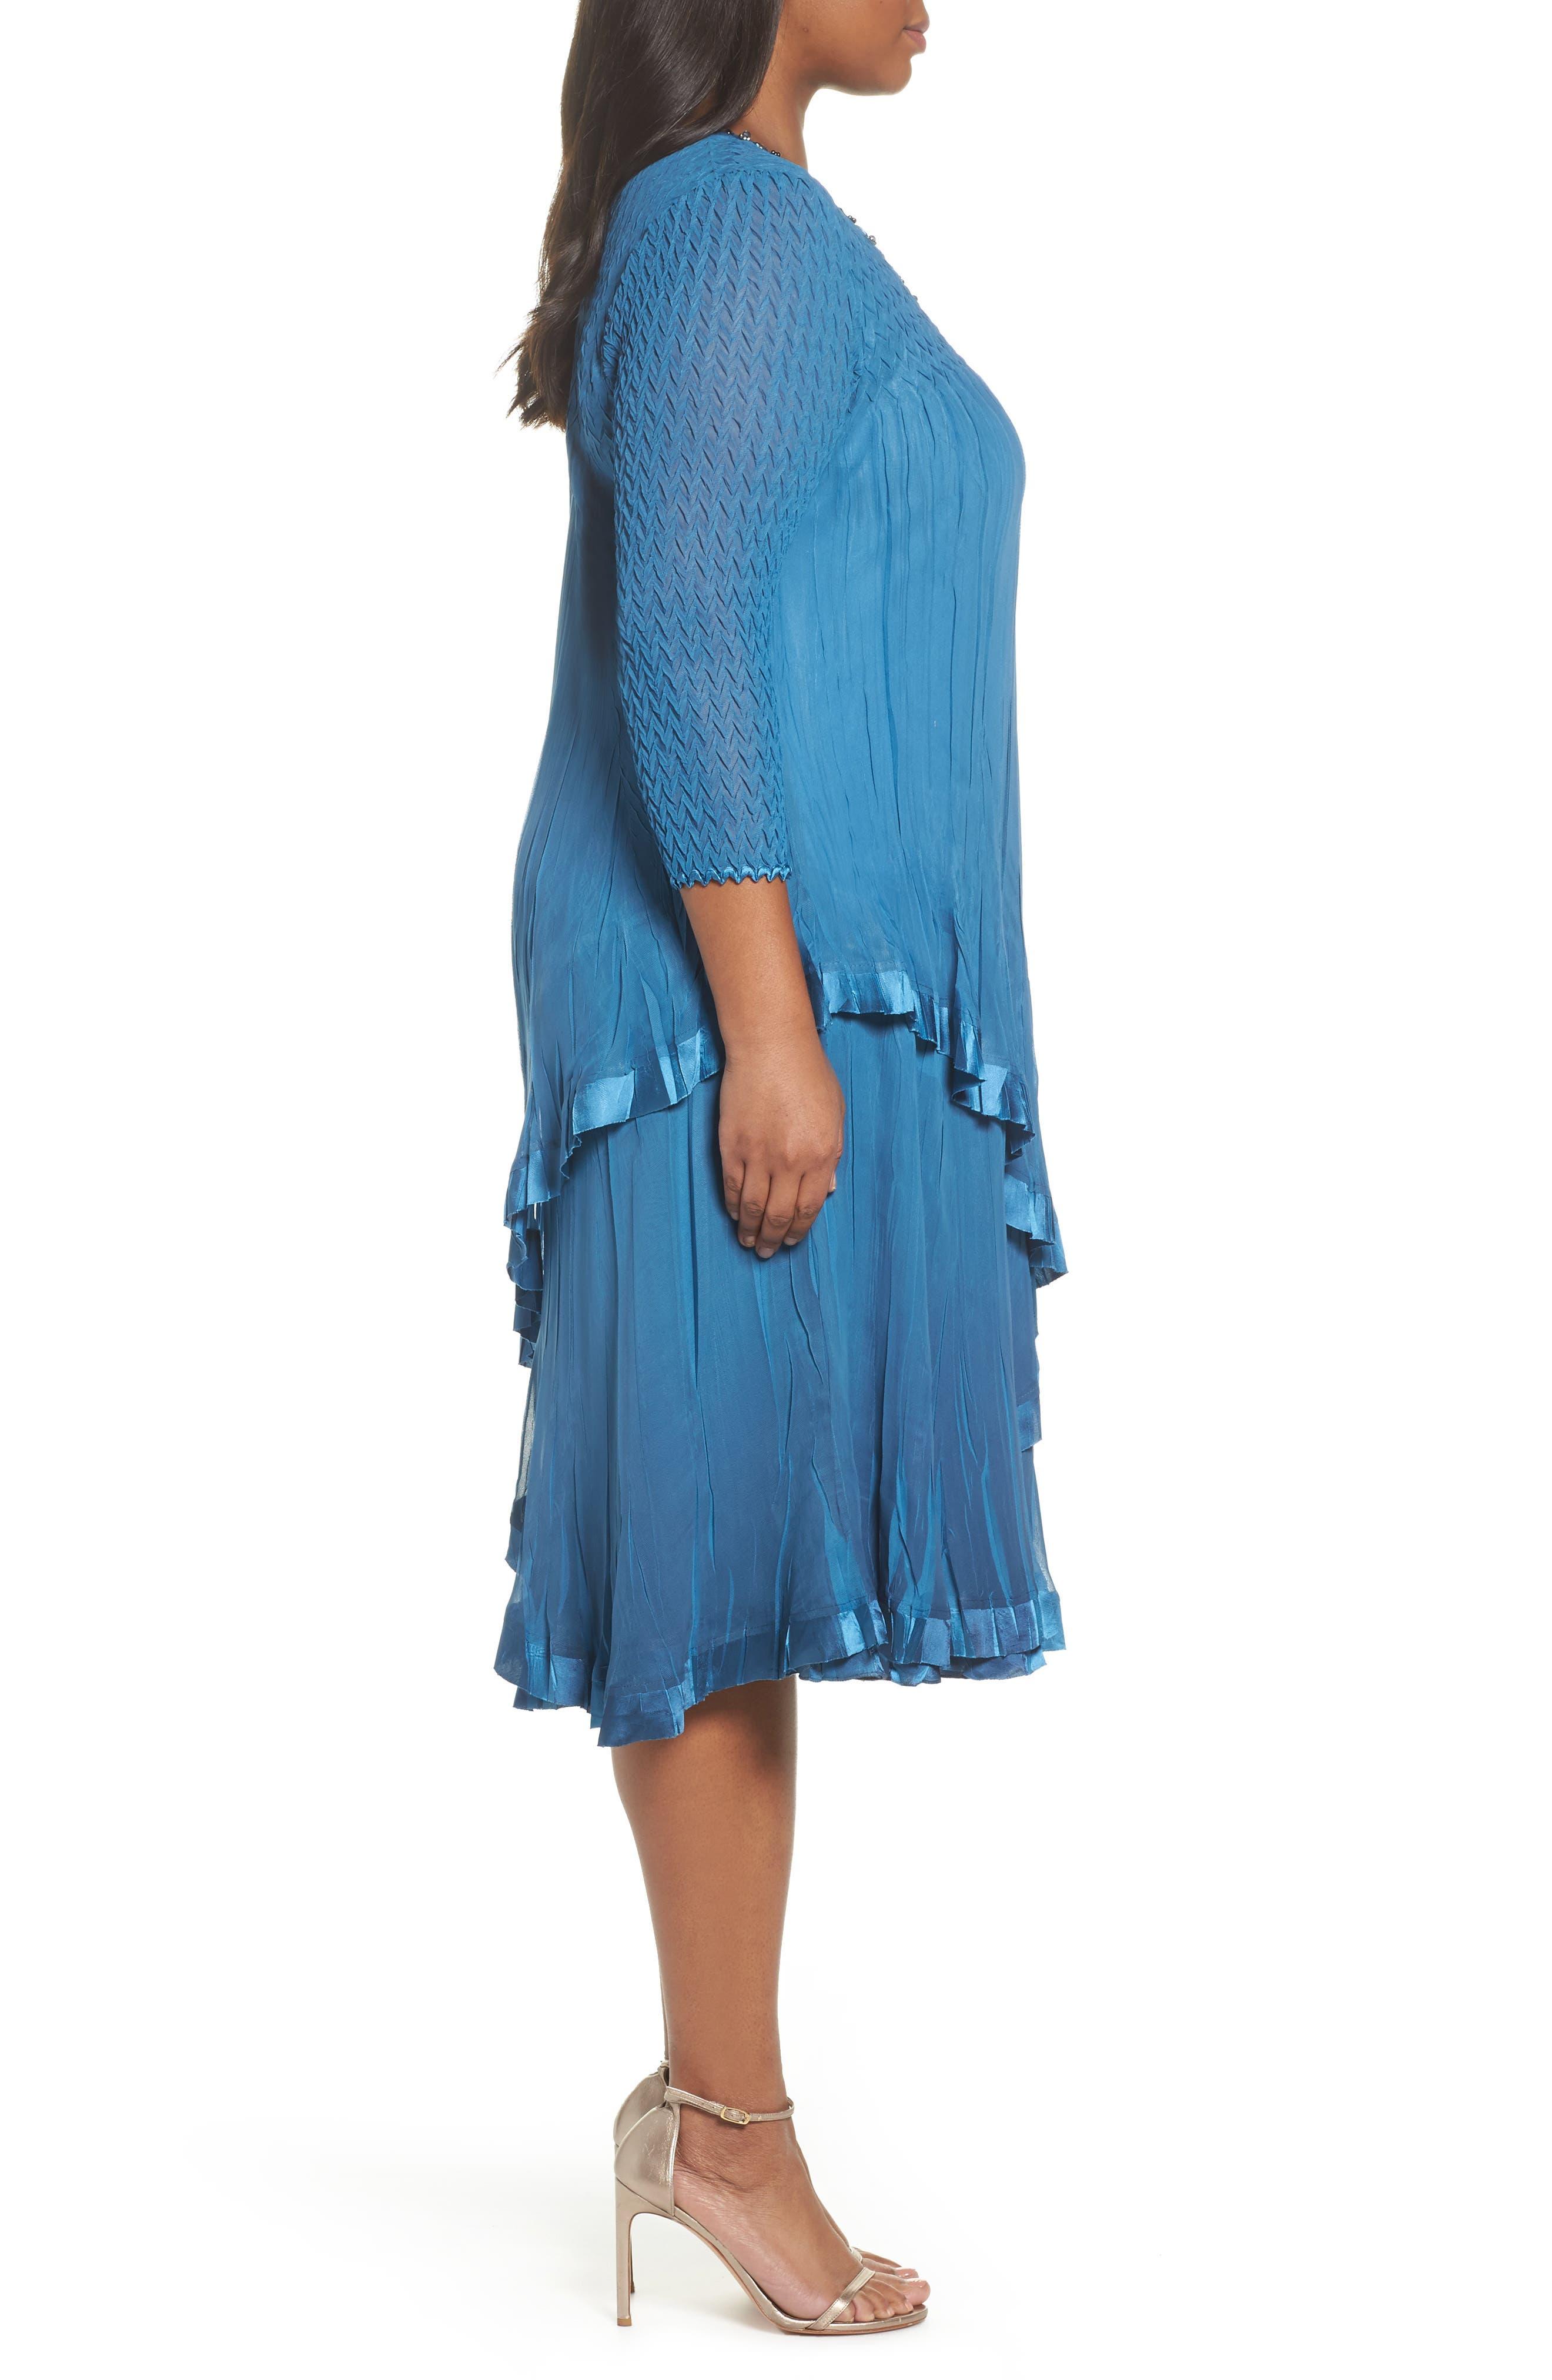 Dress Tiered Chiffon & Charmeuse Dress,                             Alternate thumbnail 3, color,                             Blue Dusk Night Ombre